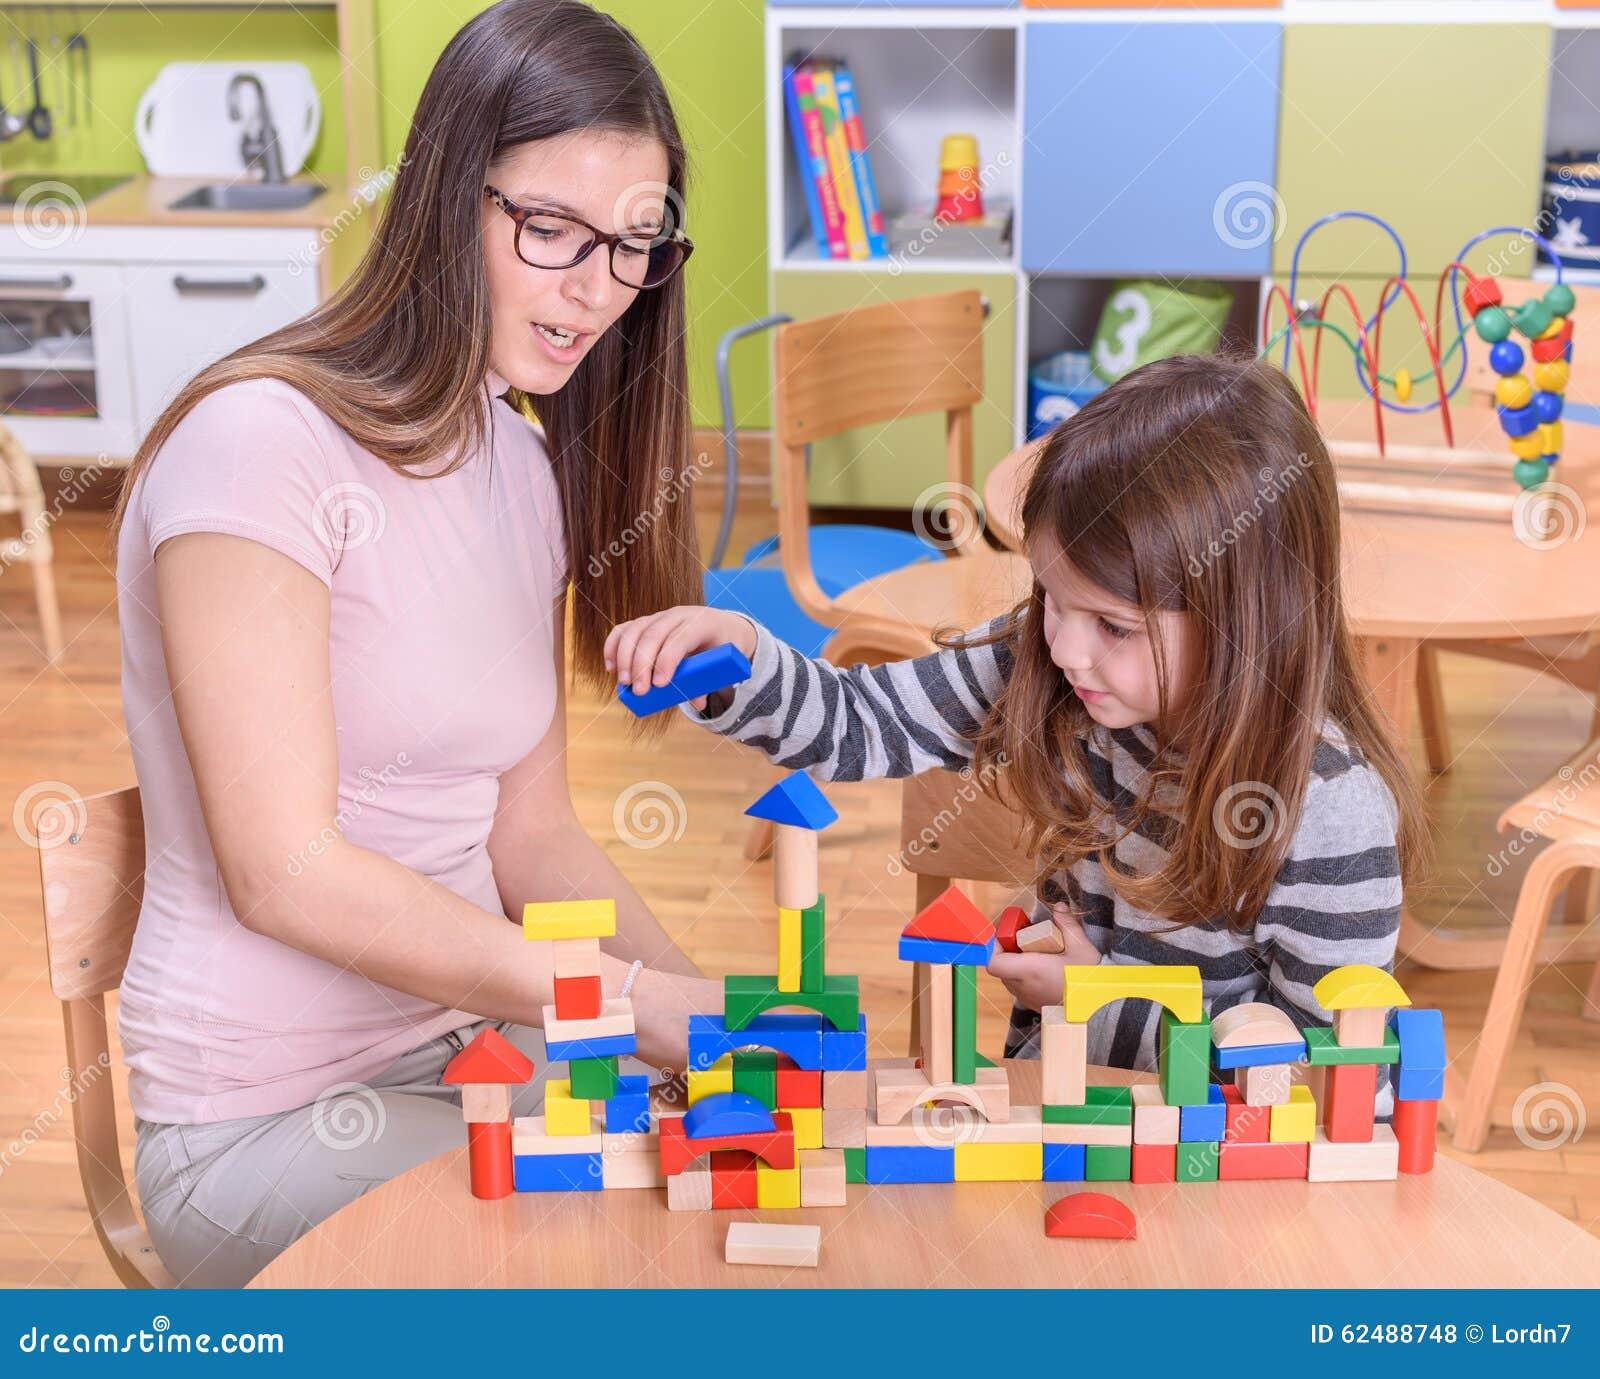 Classroom Ideas For Preschool Teachers ~ Preschool teacher helps cute girl to build toy castle